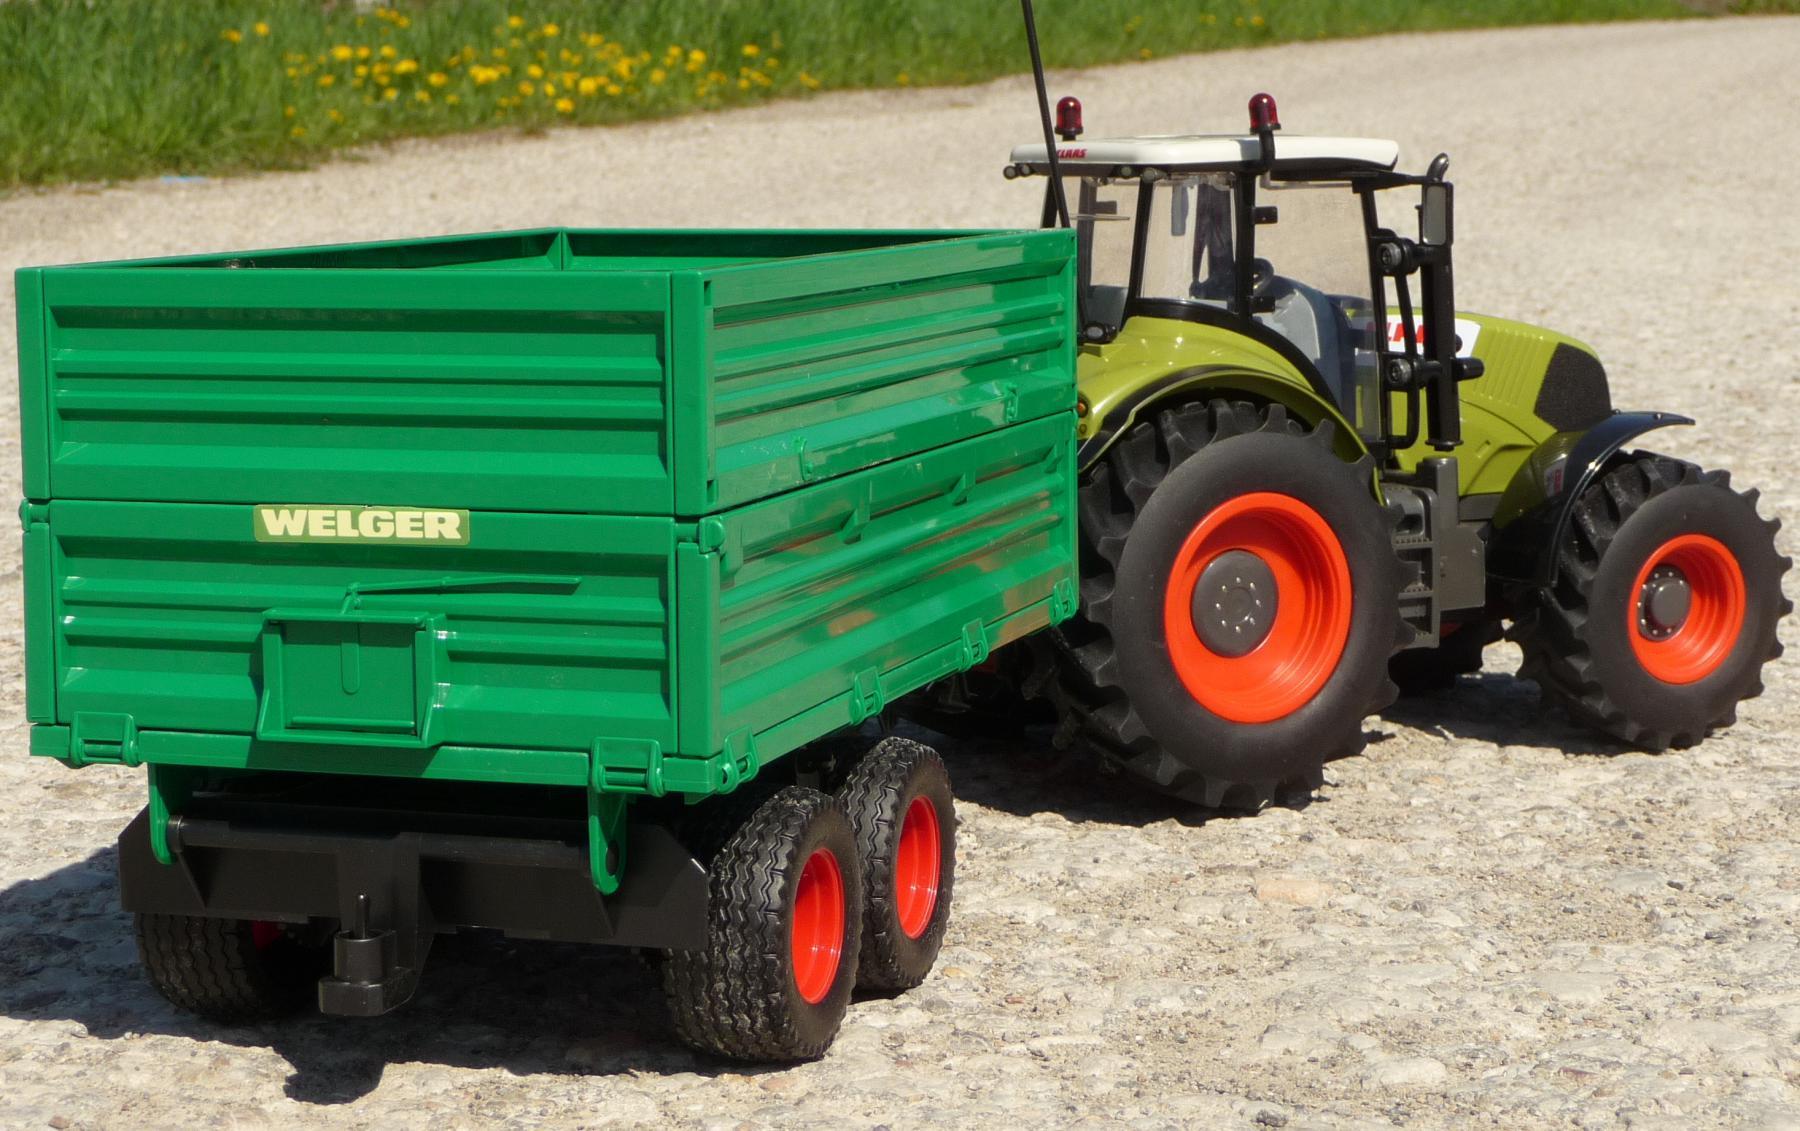 rc traktor claas axion 850 anh nger in xl l nge 72cm ferngesteuert kaufen bei wim shop. Black Bedroom Furniture Sets. Home Design Ideas